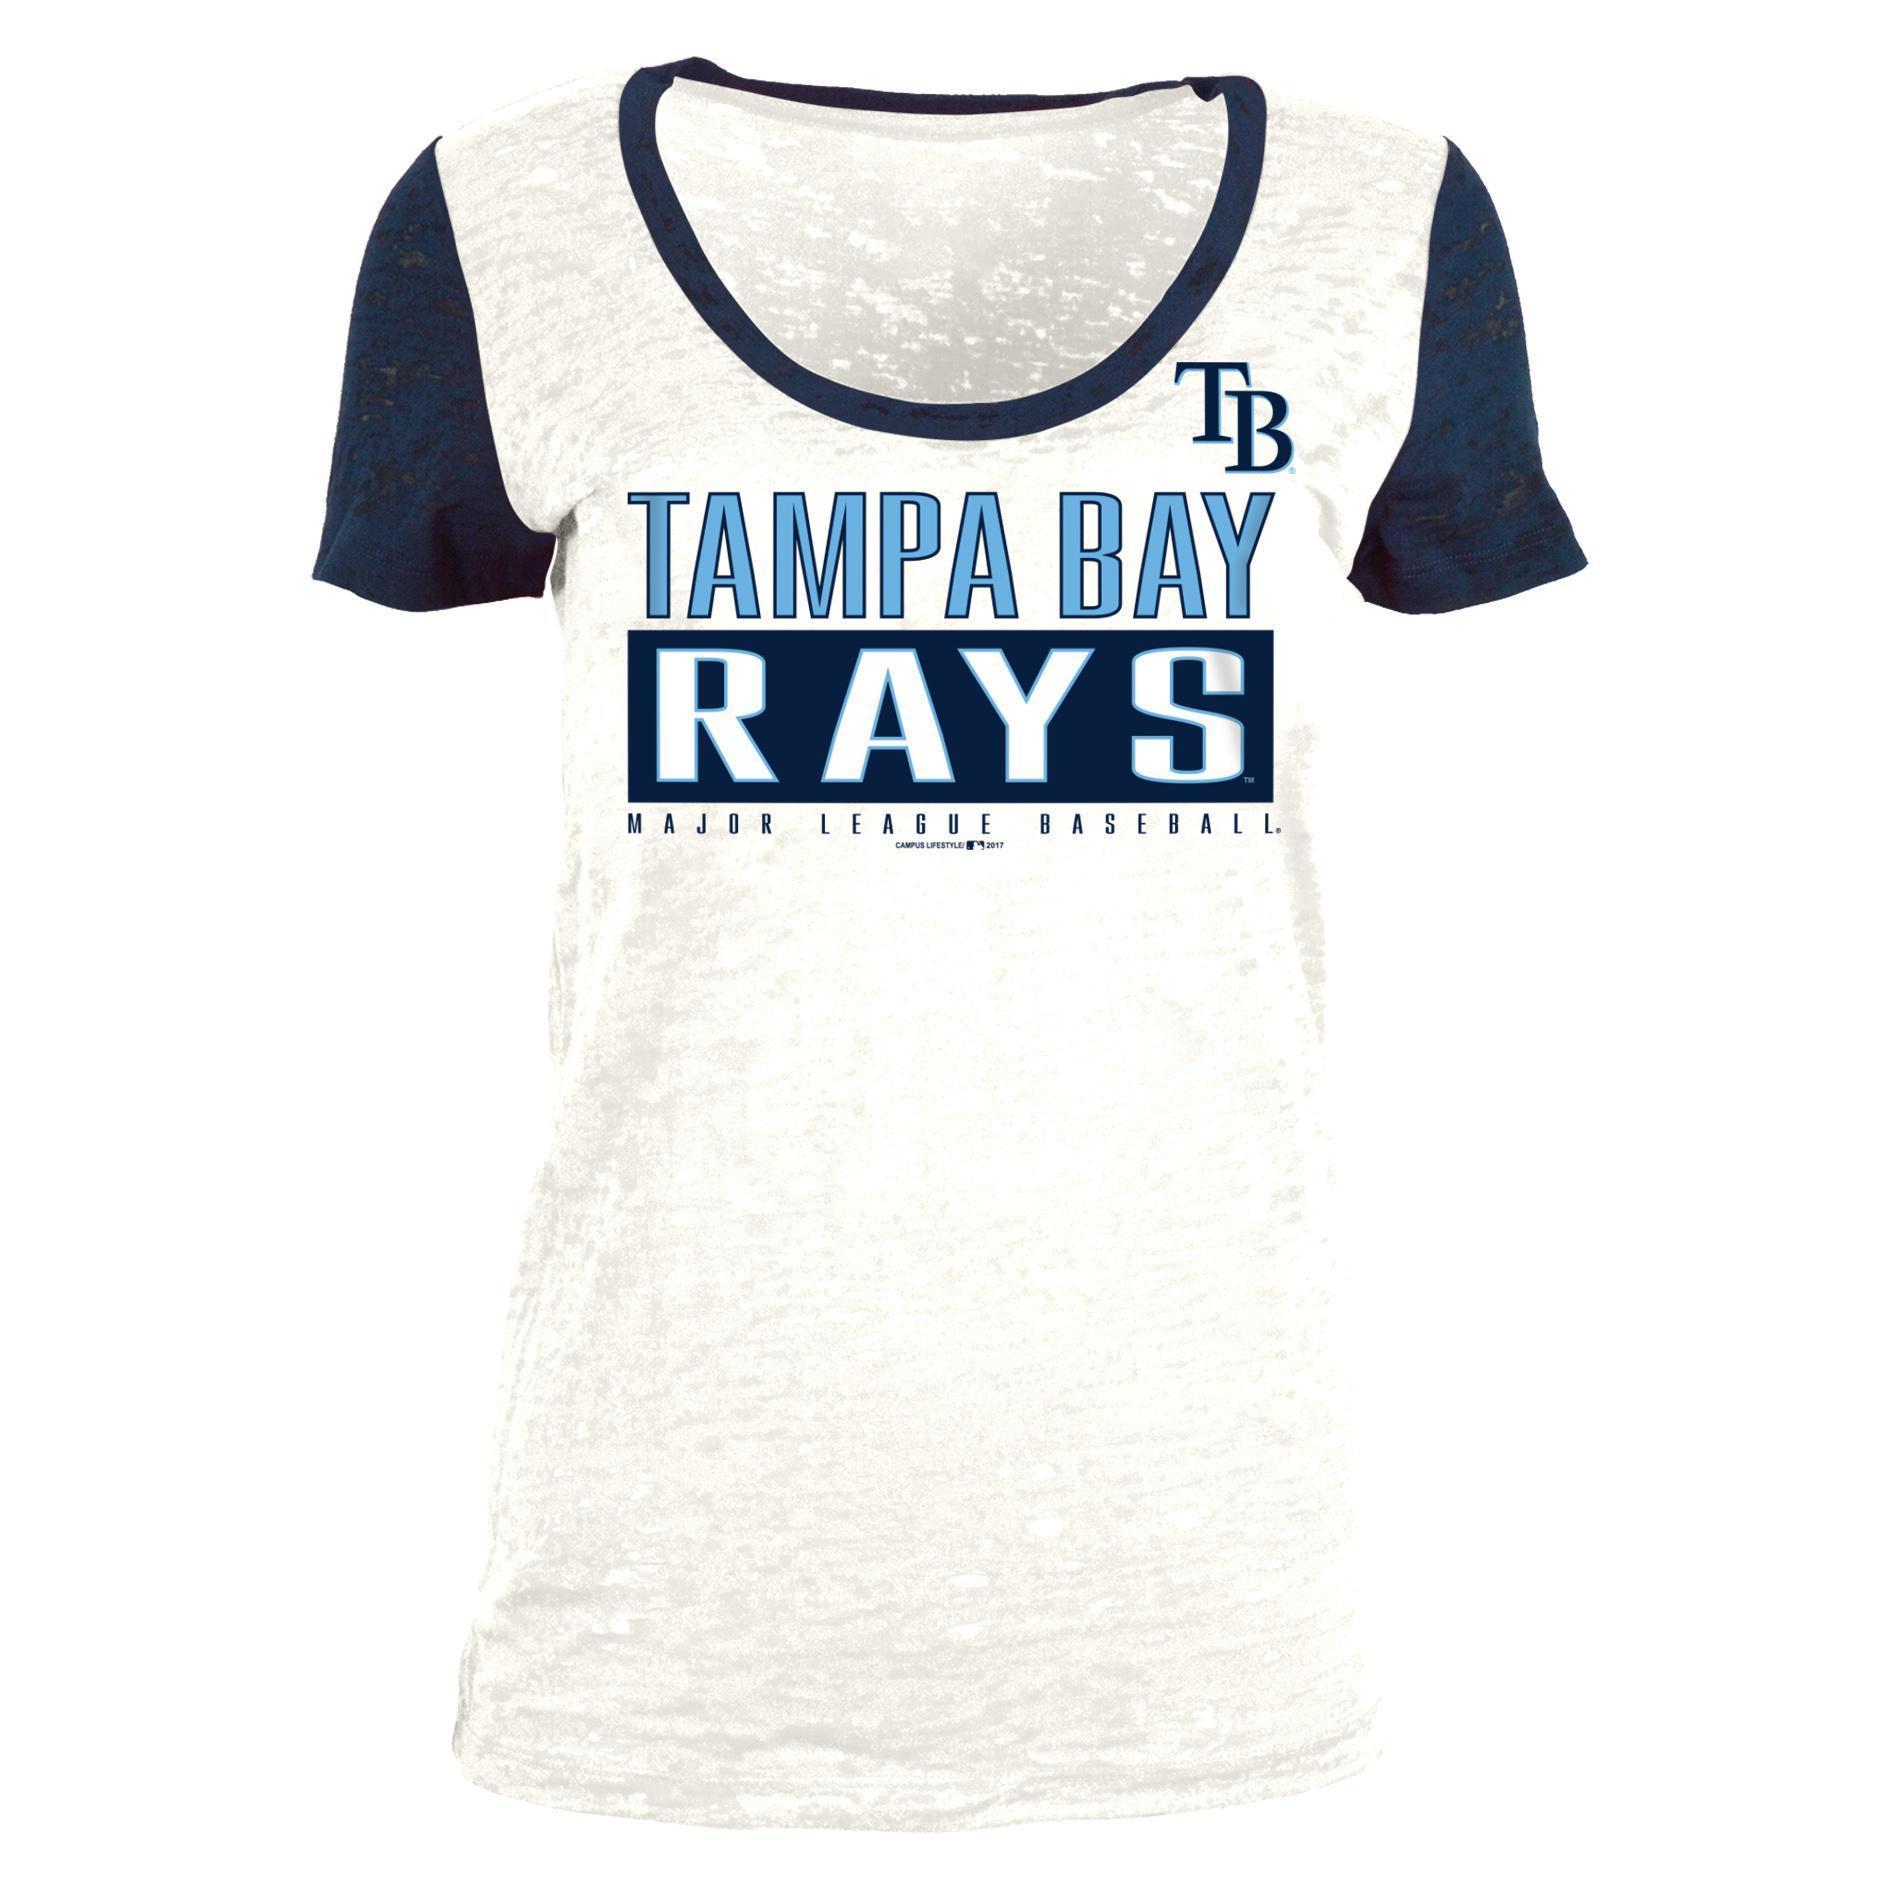 MLB Women's Burnout Graphic T-Shirt - Tampa Bay Rays PartNumber: 046VA95377412P MfgPartNumber: 7998LM2816448